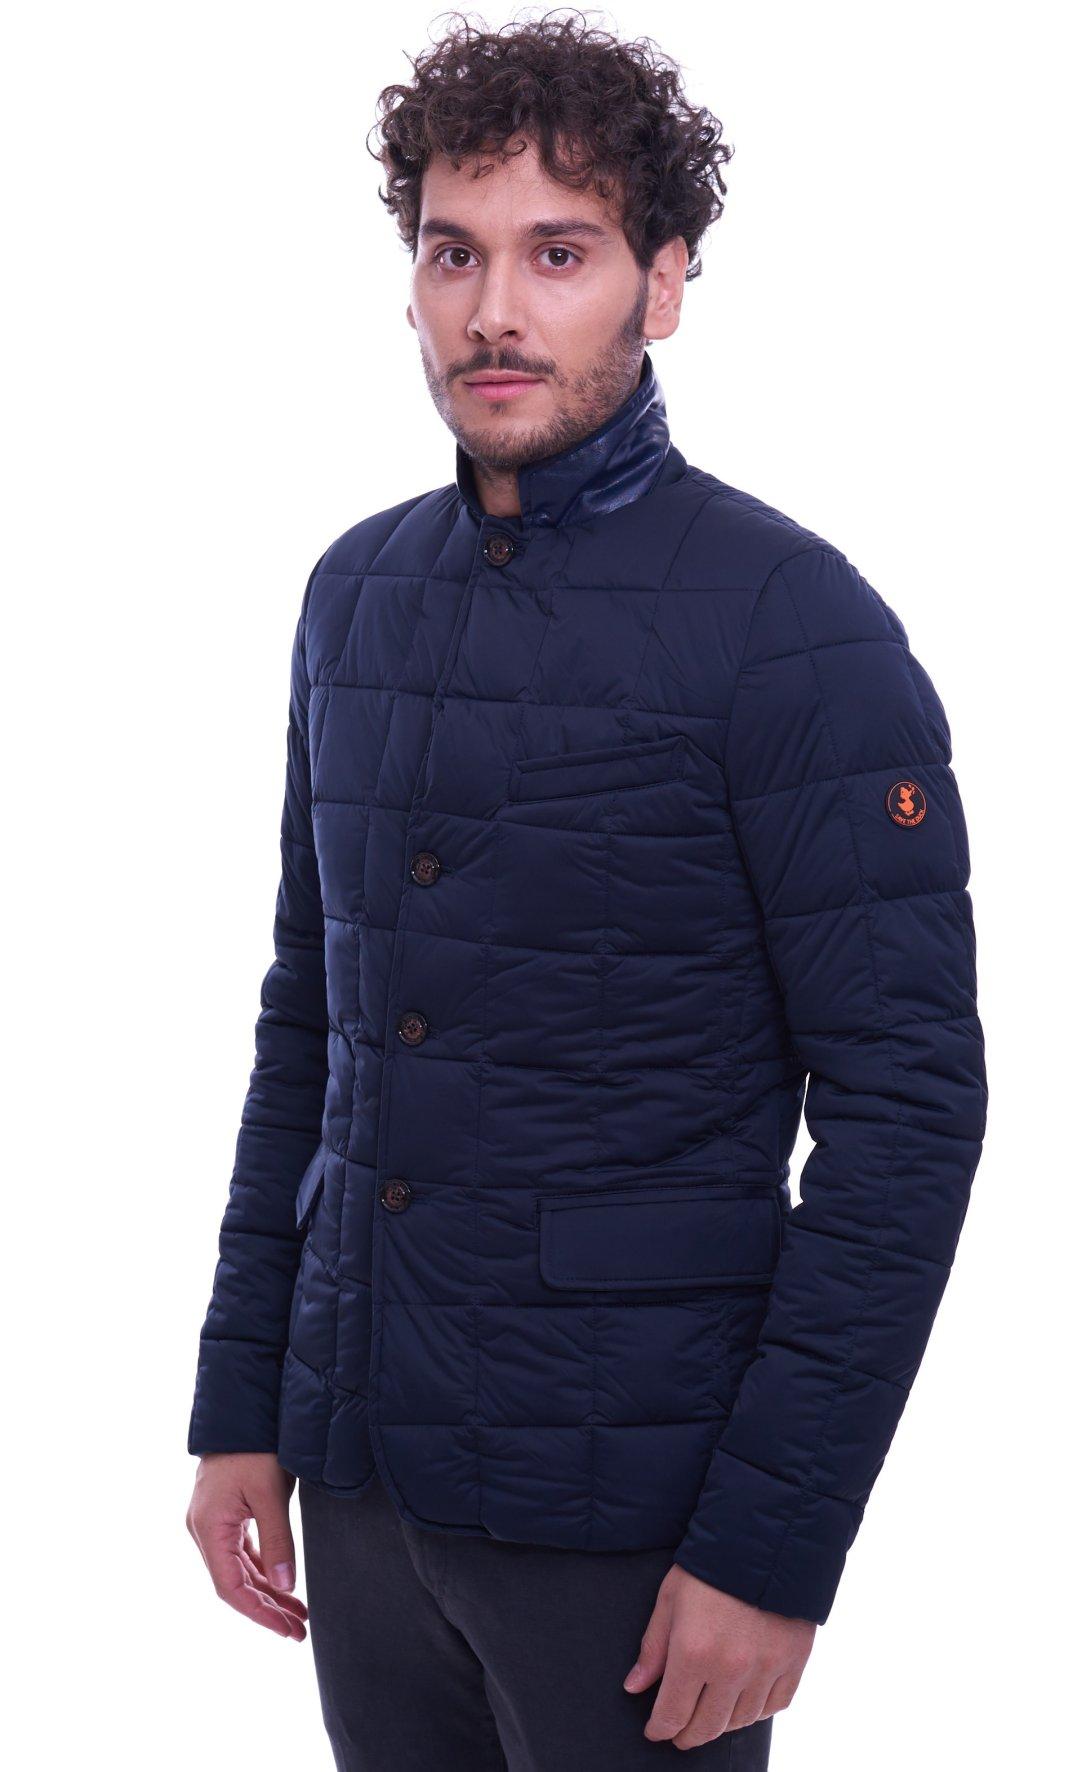 best service 386b1 6a68a Giubbotto SAVE THE DUCK stretch da uomo modello giacca blu ...